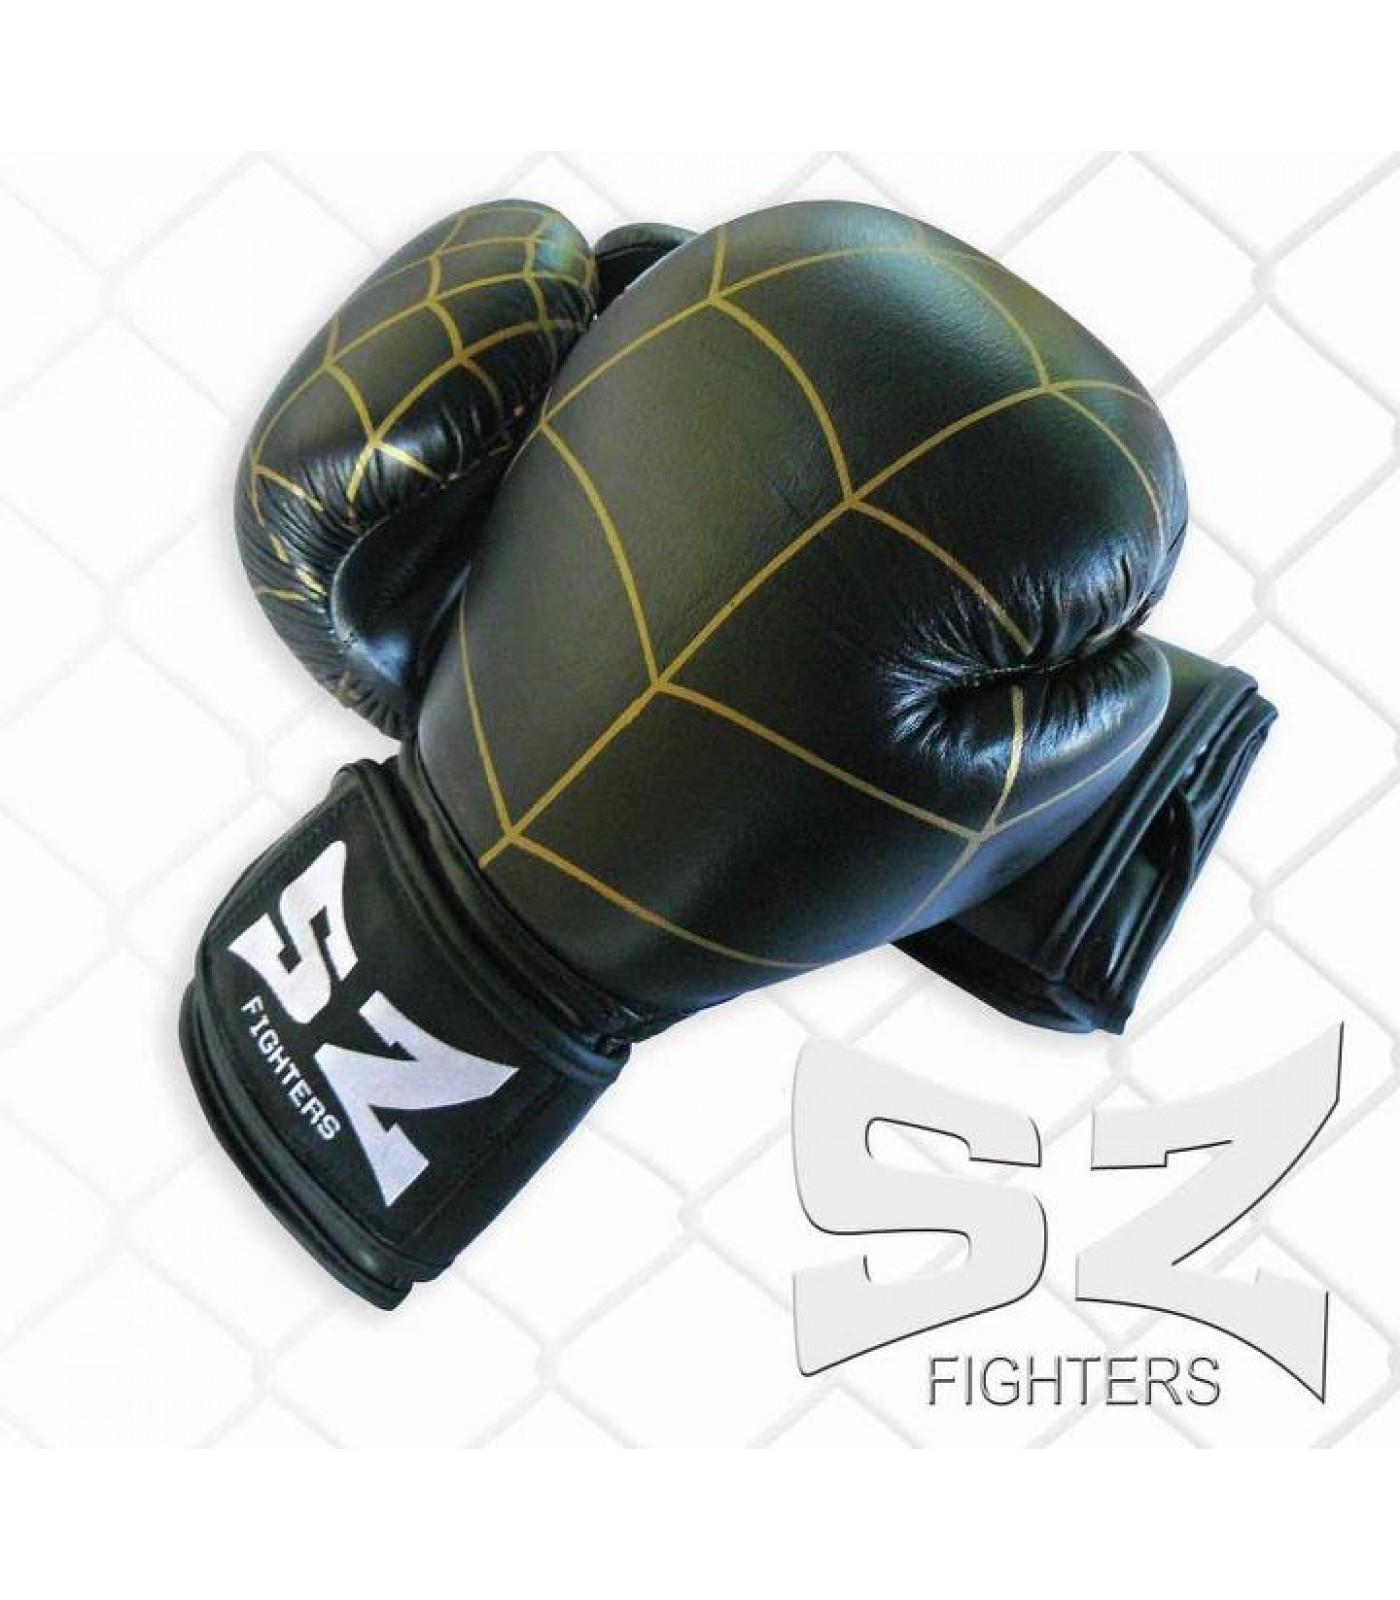 SZ Fighters - Боксови ръкавици (Естествена кожа) - паяжина